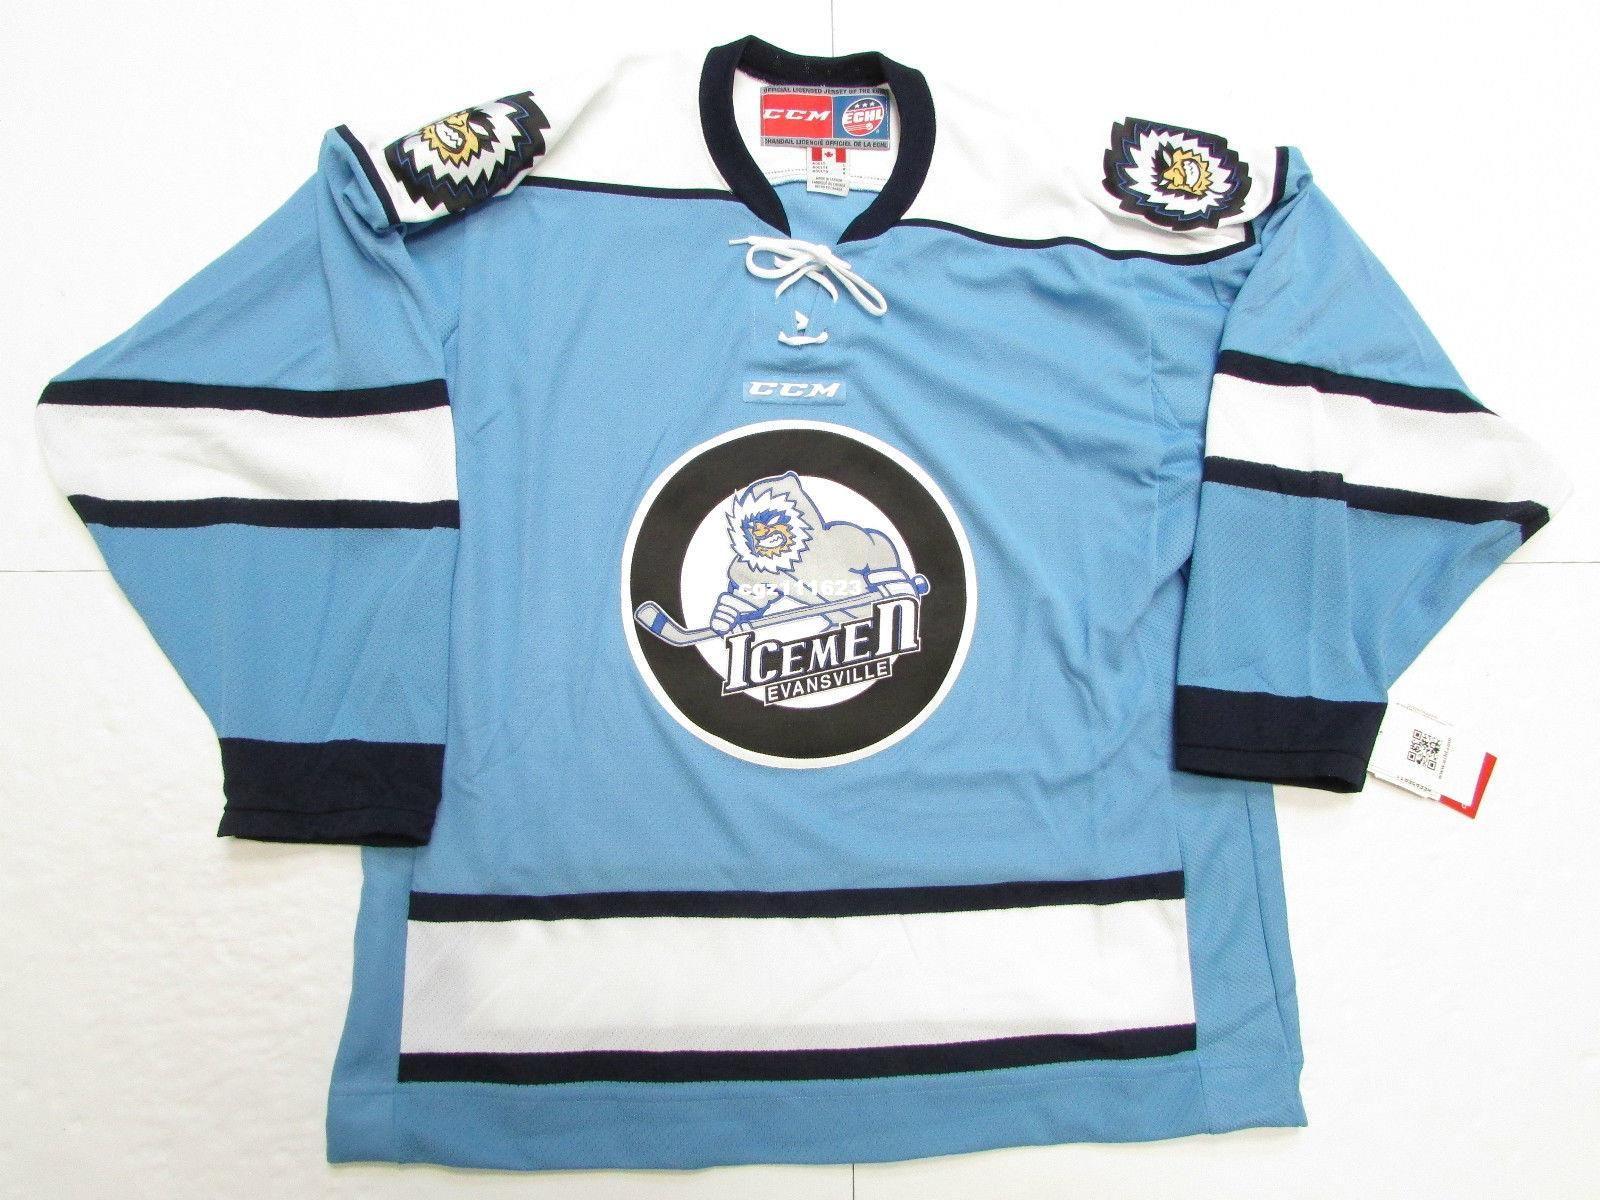 Cheap Custom EVANSVILLE ICEMEN BLUE ECHL CCM HOCKEY JERSEY Mens Jerseys CCM  Hockey Jersey Hockey Jersey Retro Hockey Jersey Online with  65.58 Piece on  ... cce23cf0e